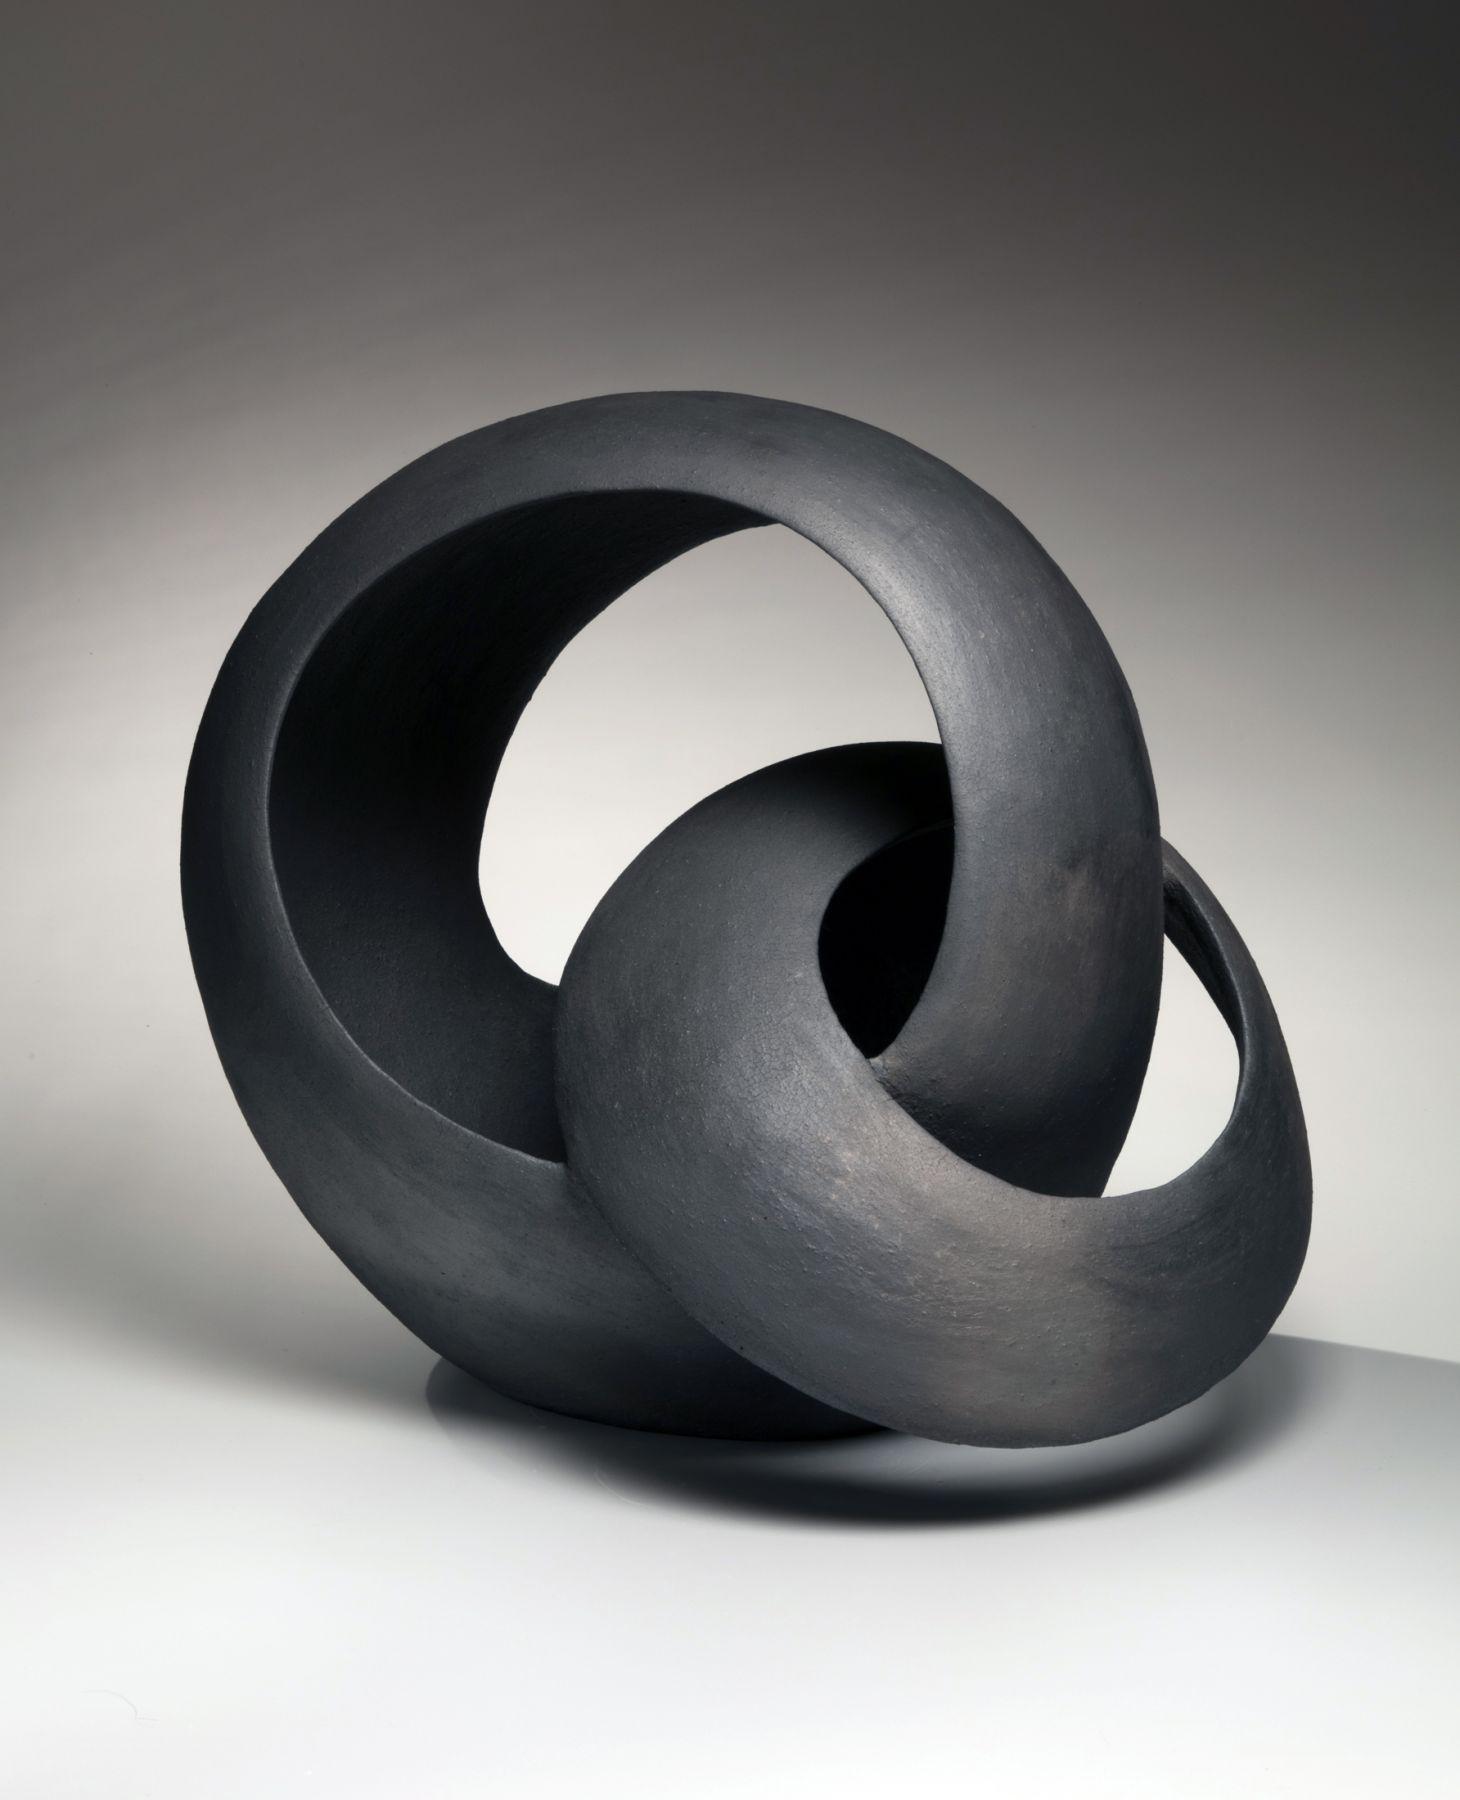 Kurokawa Tōru (b. 1984), Black sculpture of two interlaced loops